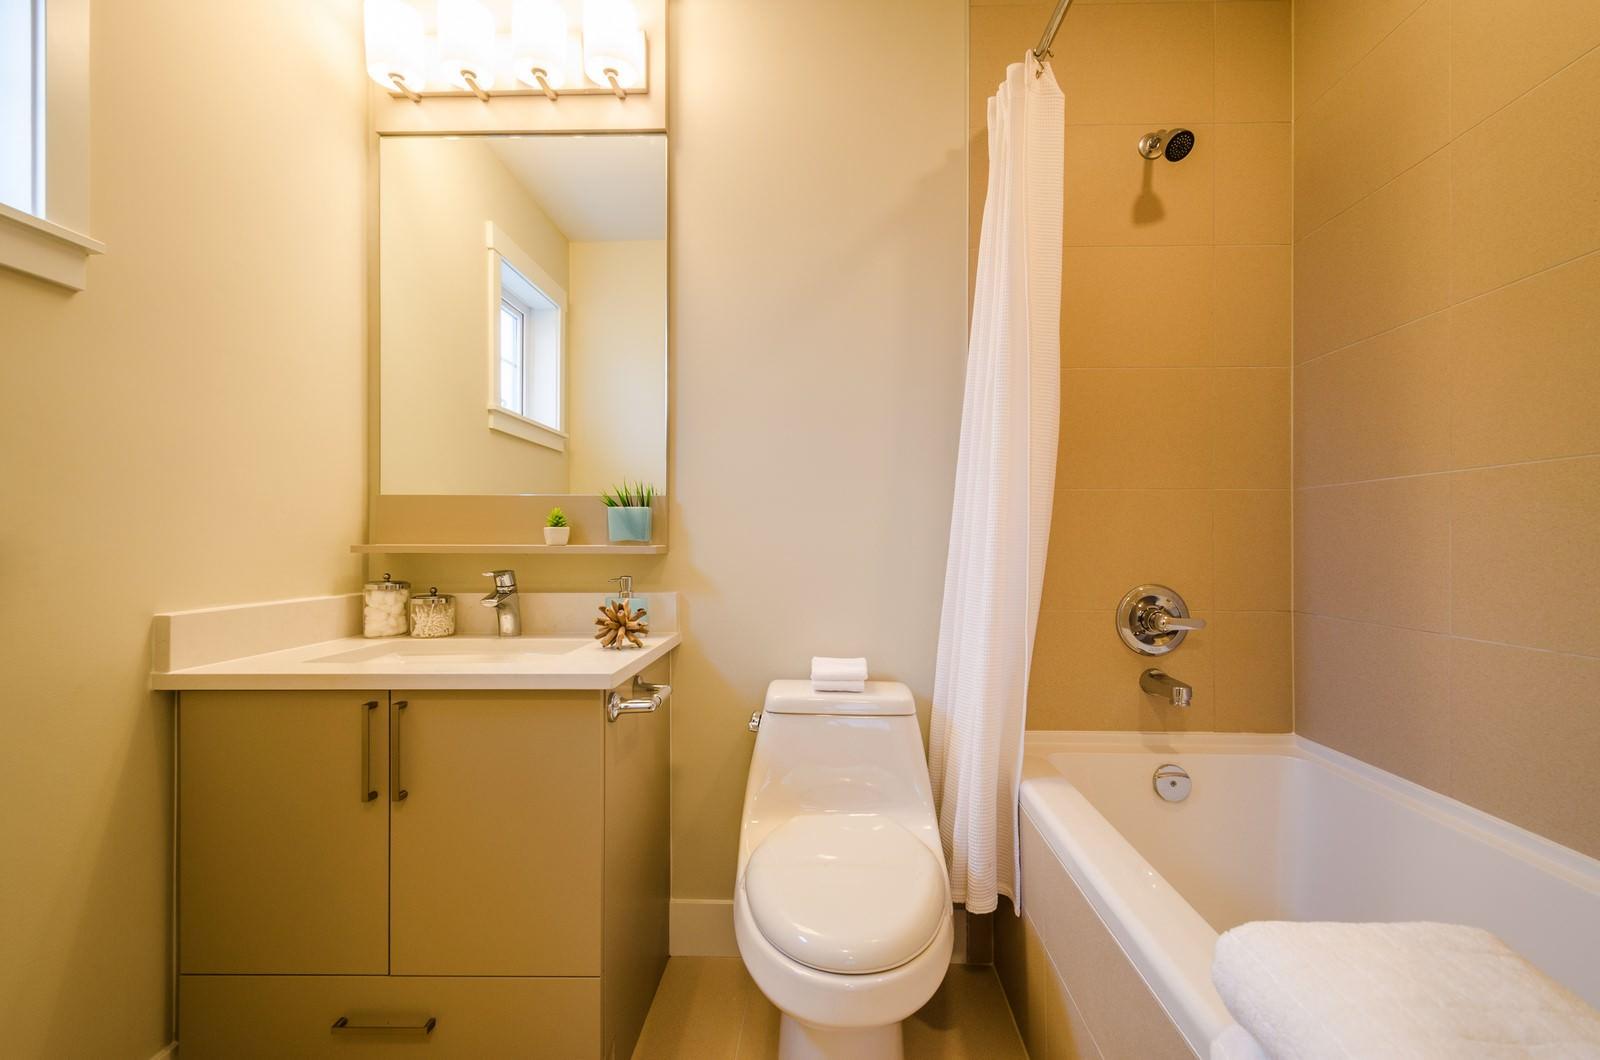 100 norme electrique salle bain pmr d couvrez nos for Norme ventilation salle de bain